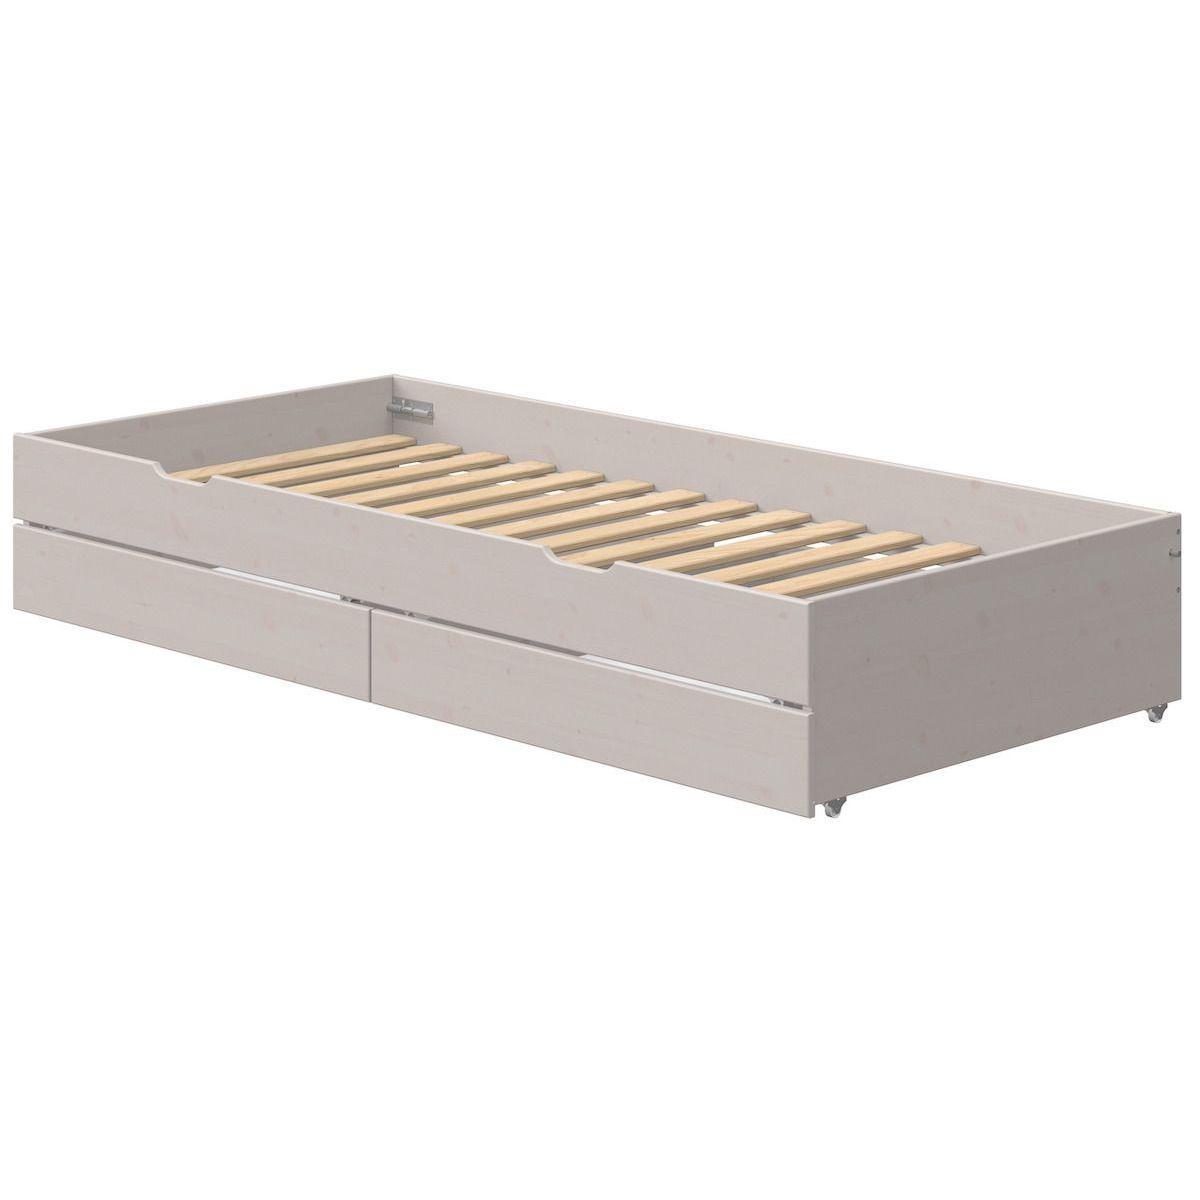 Lit gigogne 90x190cm 2 tiroirs lit bas CLASSIC Flexa grey washed